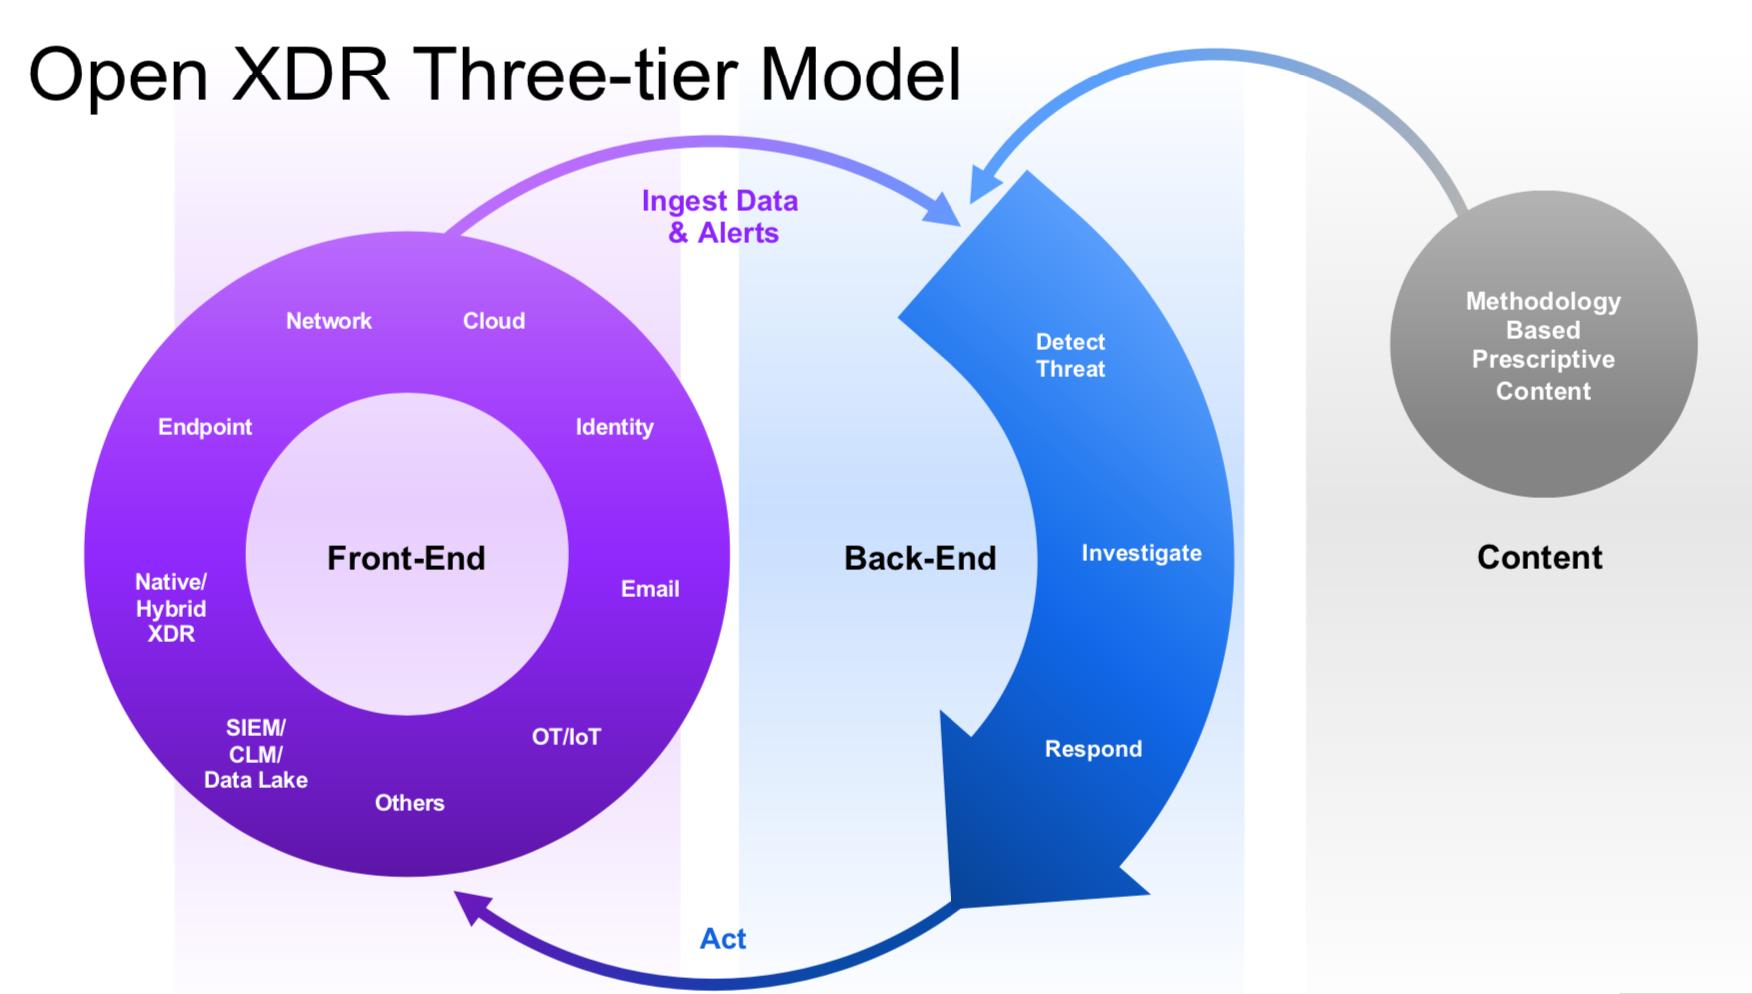 Open XDR Three-Tier Model